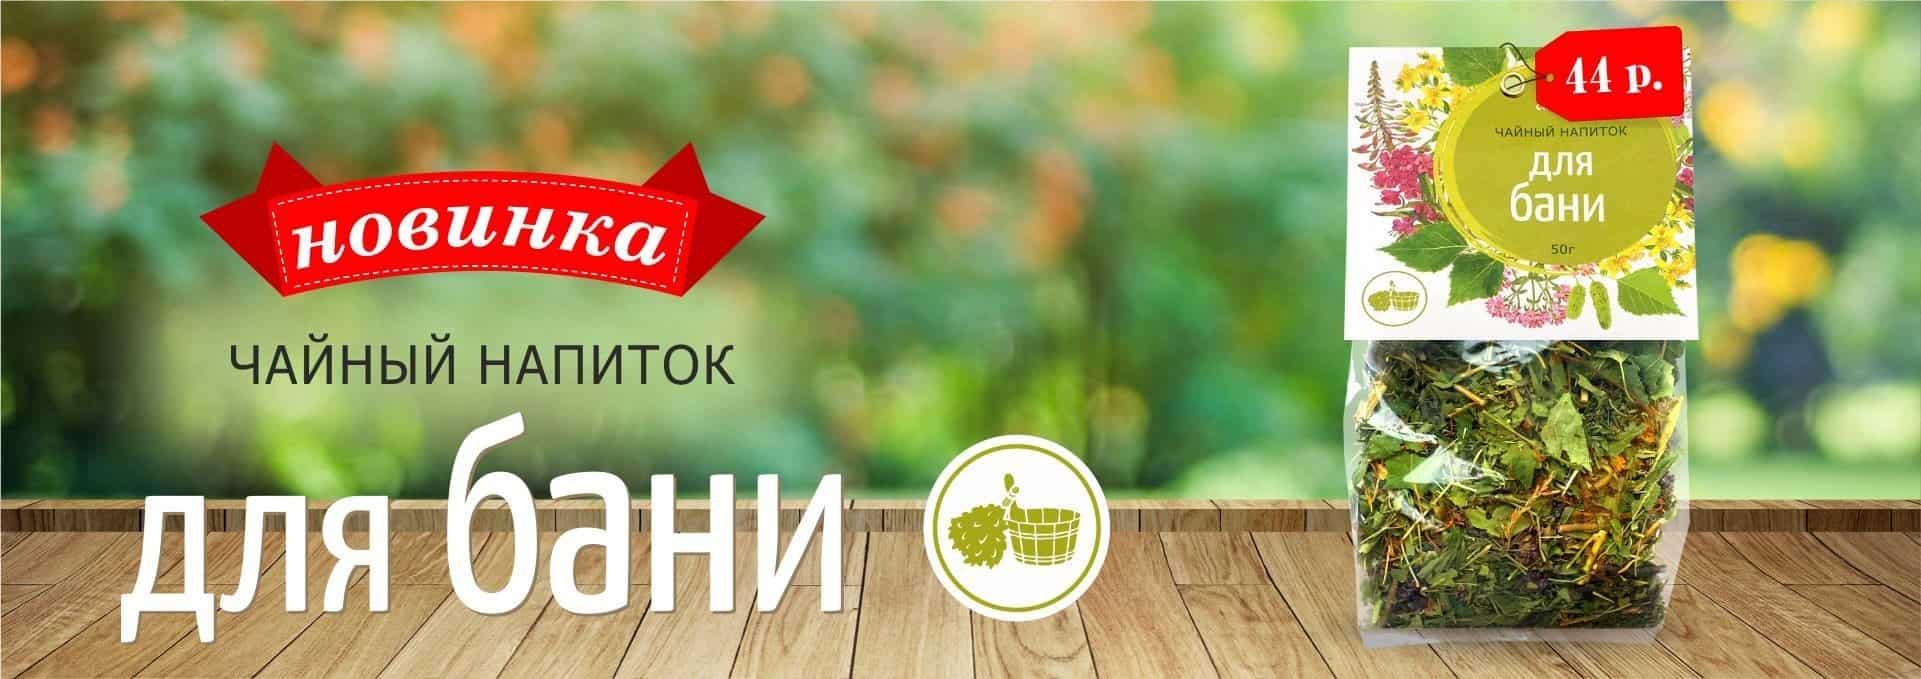 catalog/slides/chai-dlya-bani.jpg